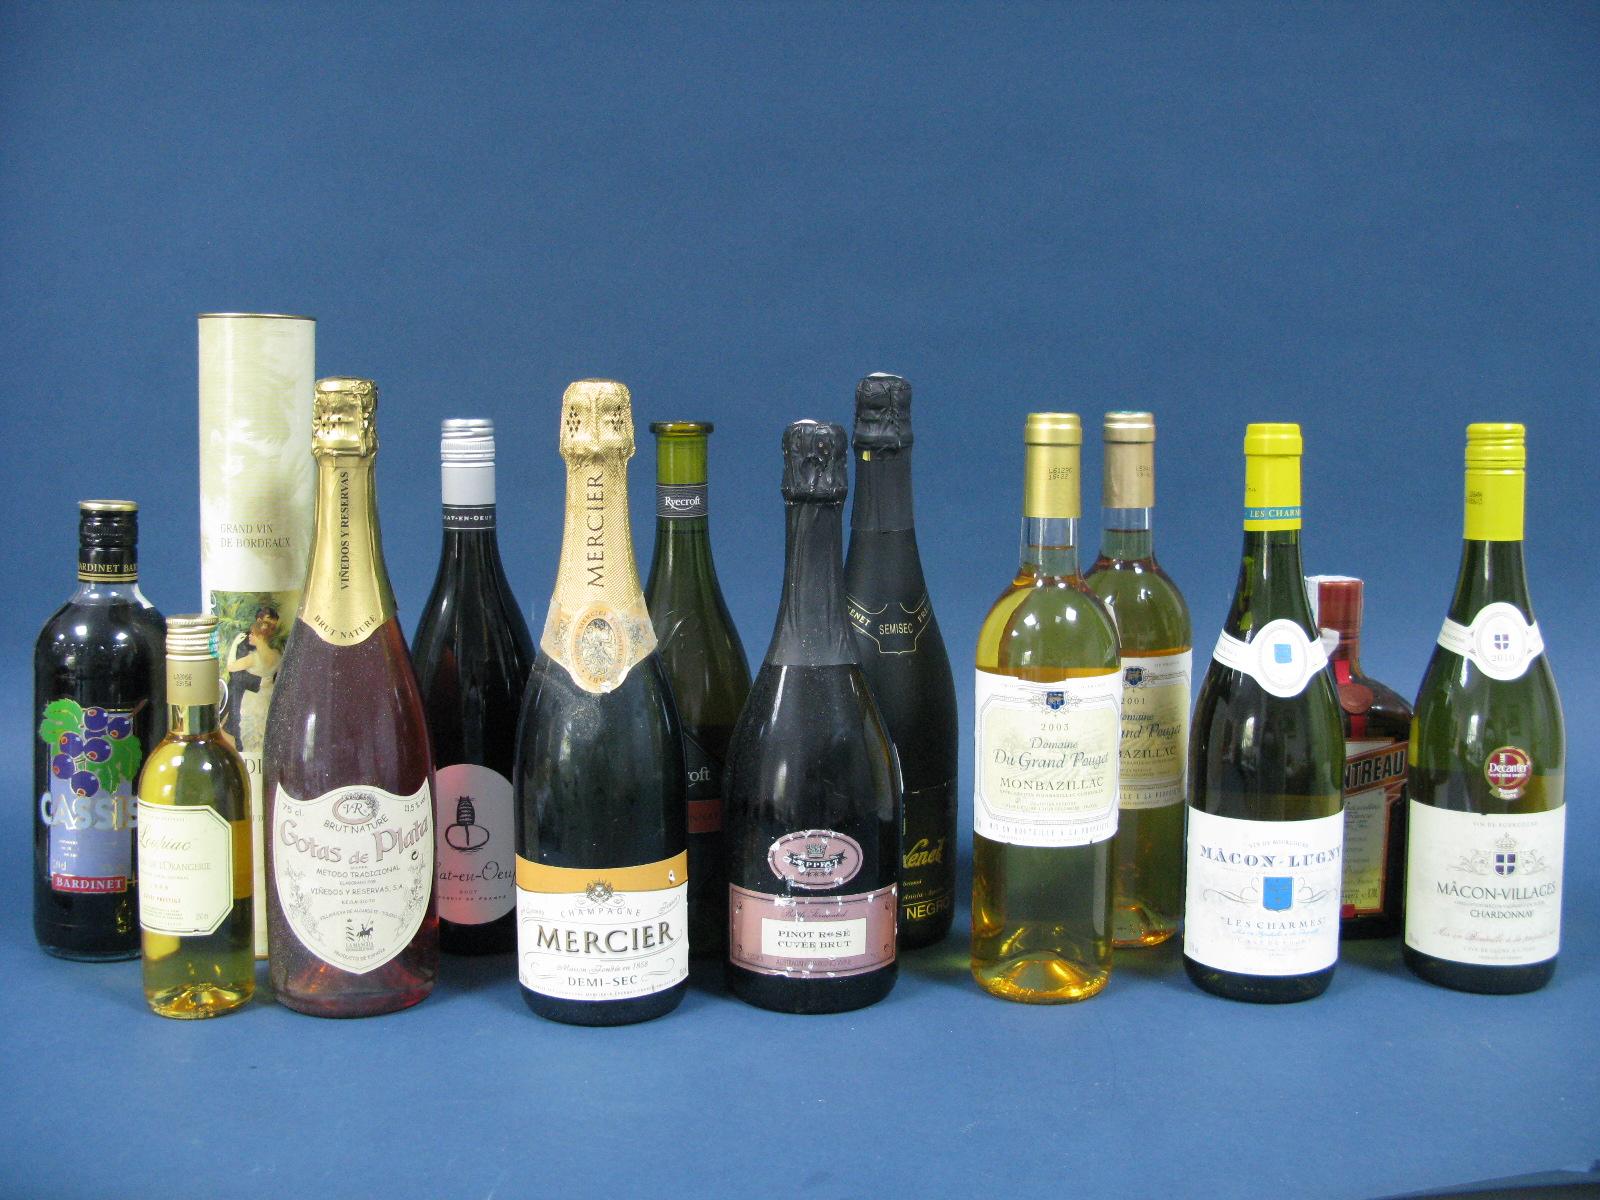 Lot 24 - Wine - A Mixed Collection, including Chateau De L'Orangerie Cuvee prestige 1998,